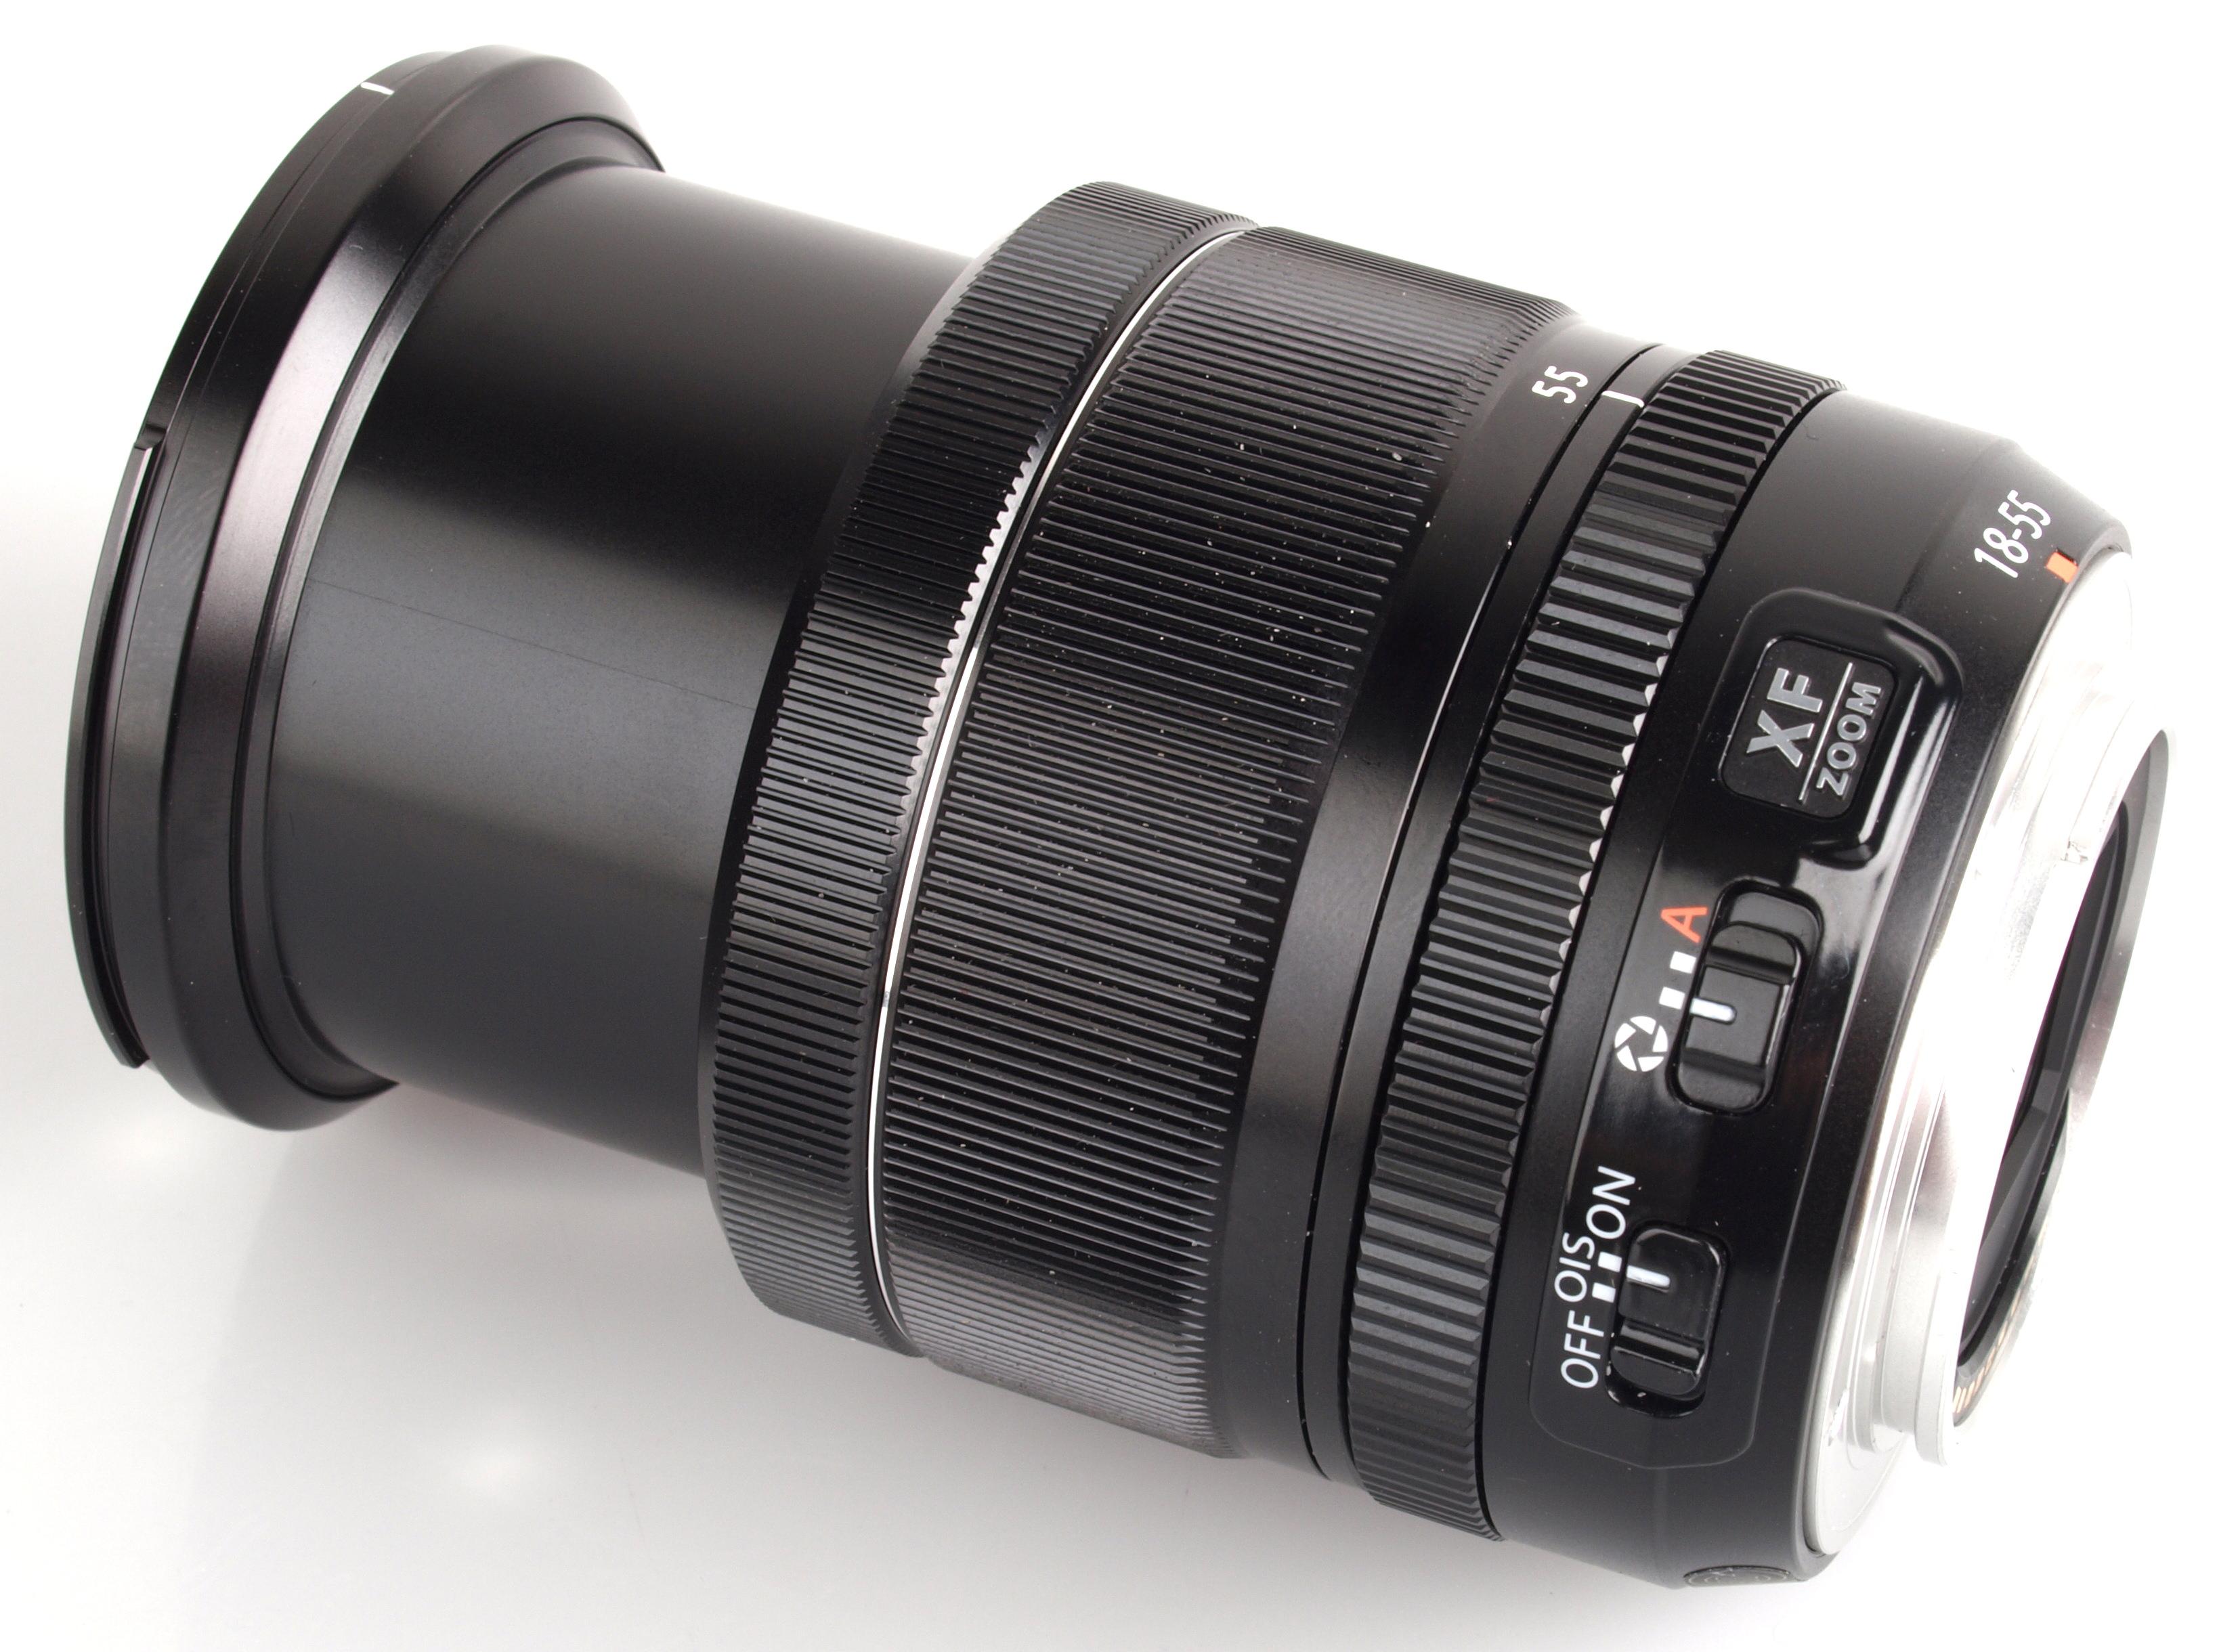 fujifilm fujinon xf 18 55mm f 2 8 4 r lm ois lens review. Black Bedroom Furniture Sets. Home Design Ideas